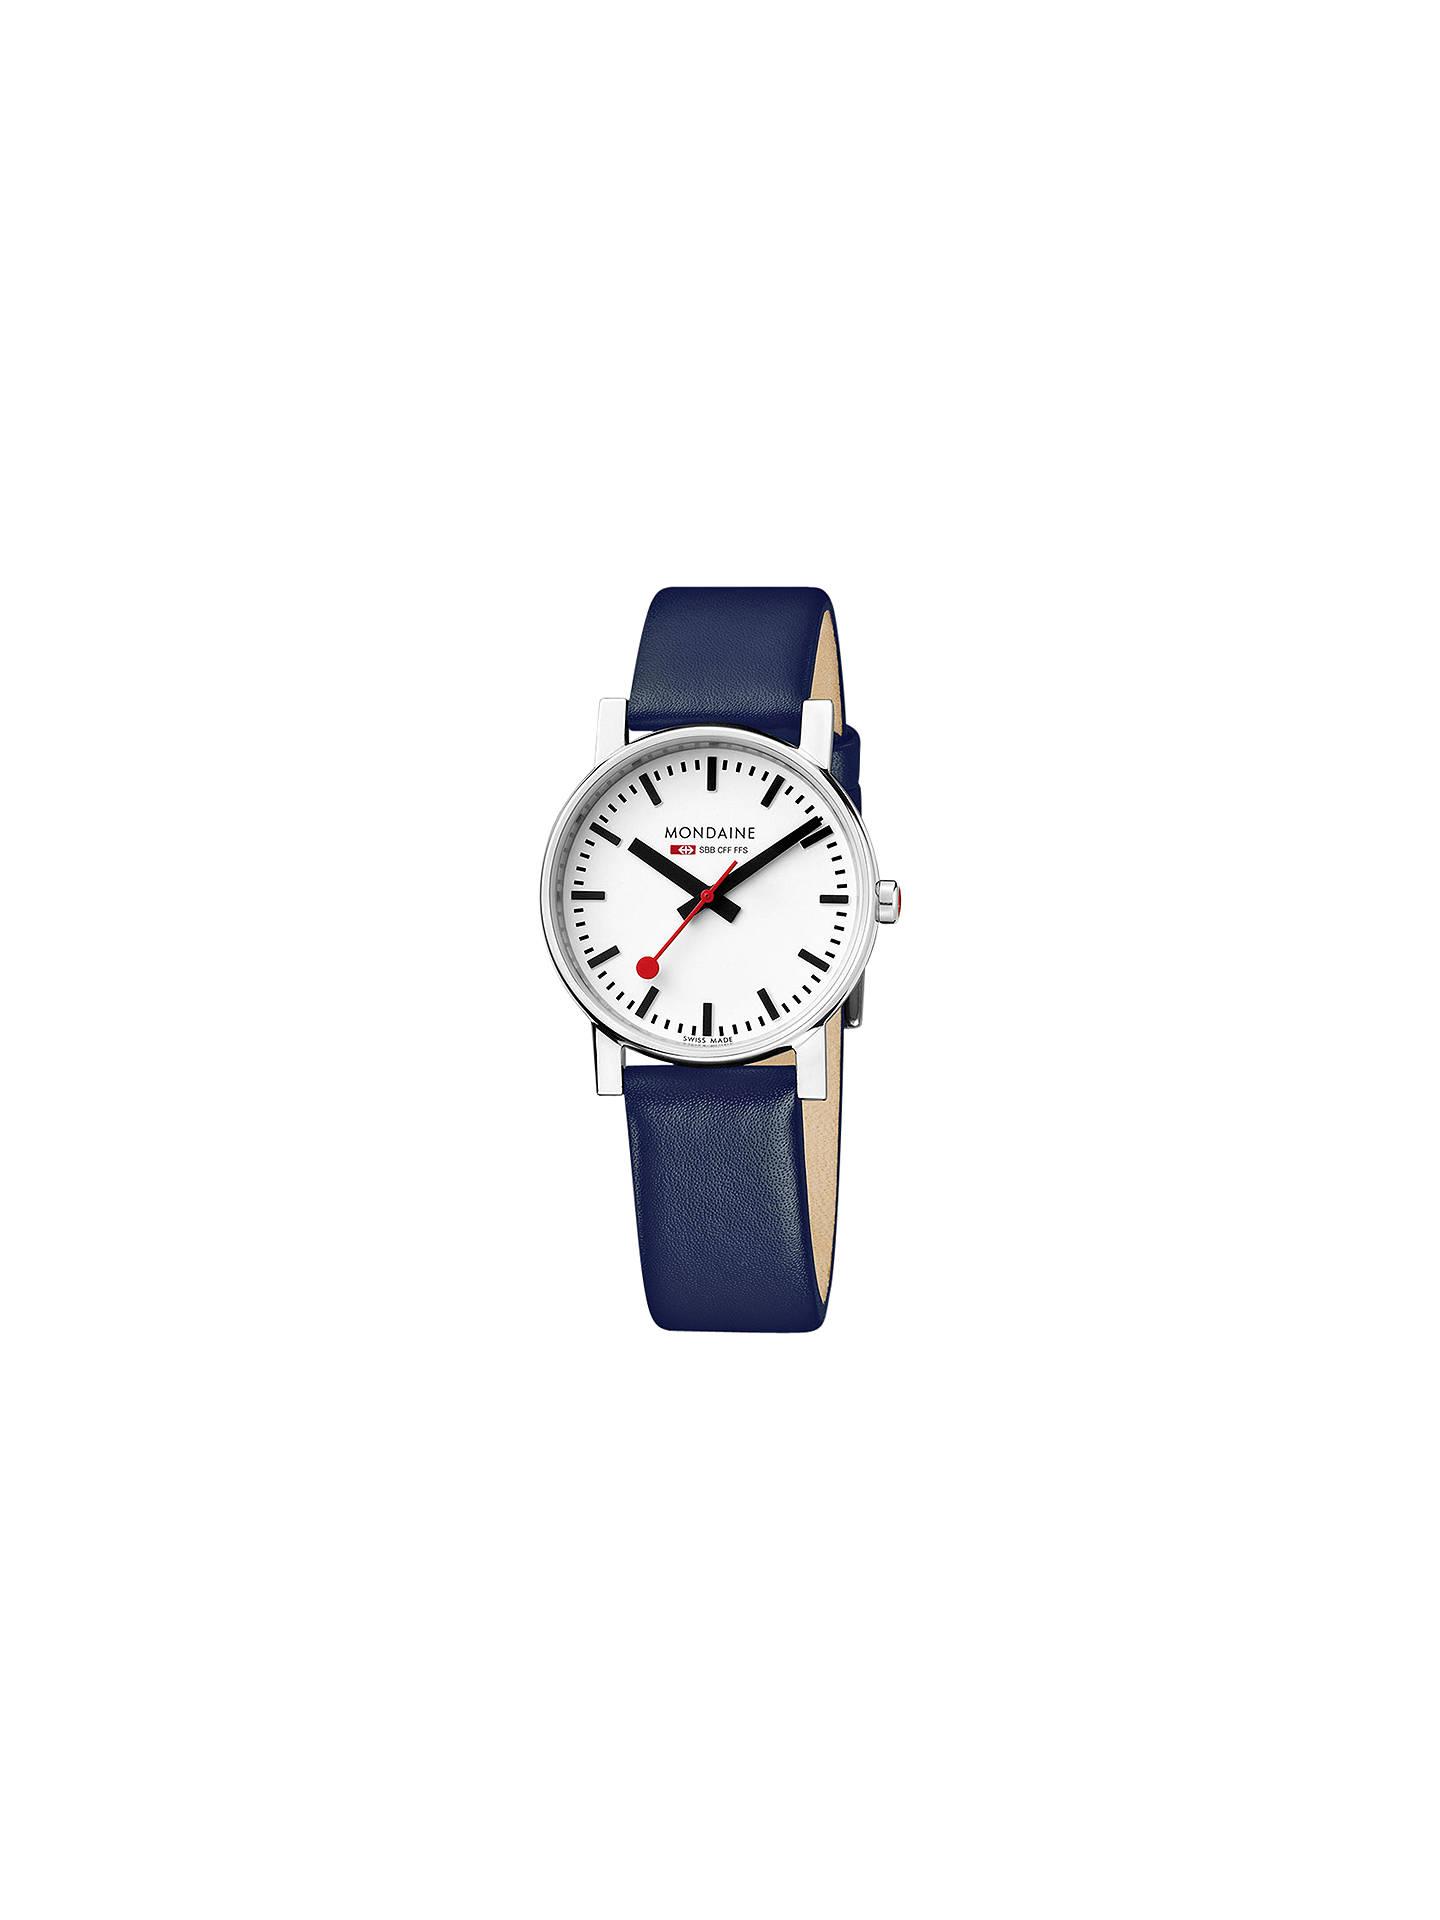 Mondaine Unisex Exclusive Leather Strap Watch at John Lewis   Partners 7a5e6ccf16